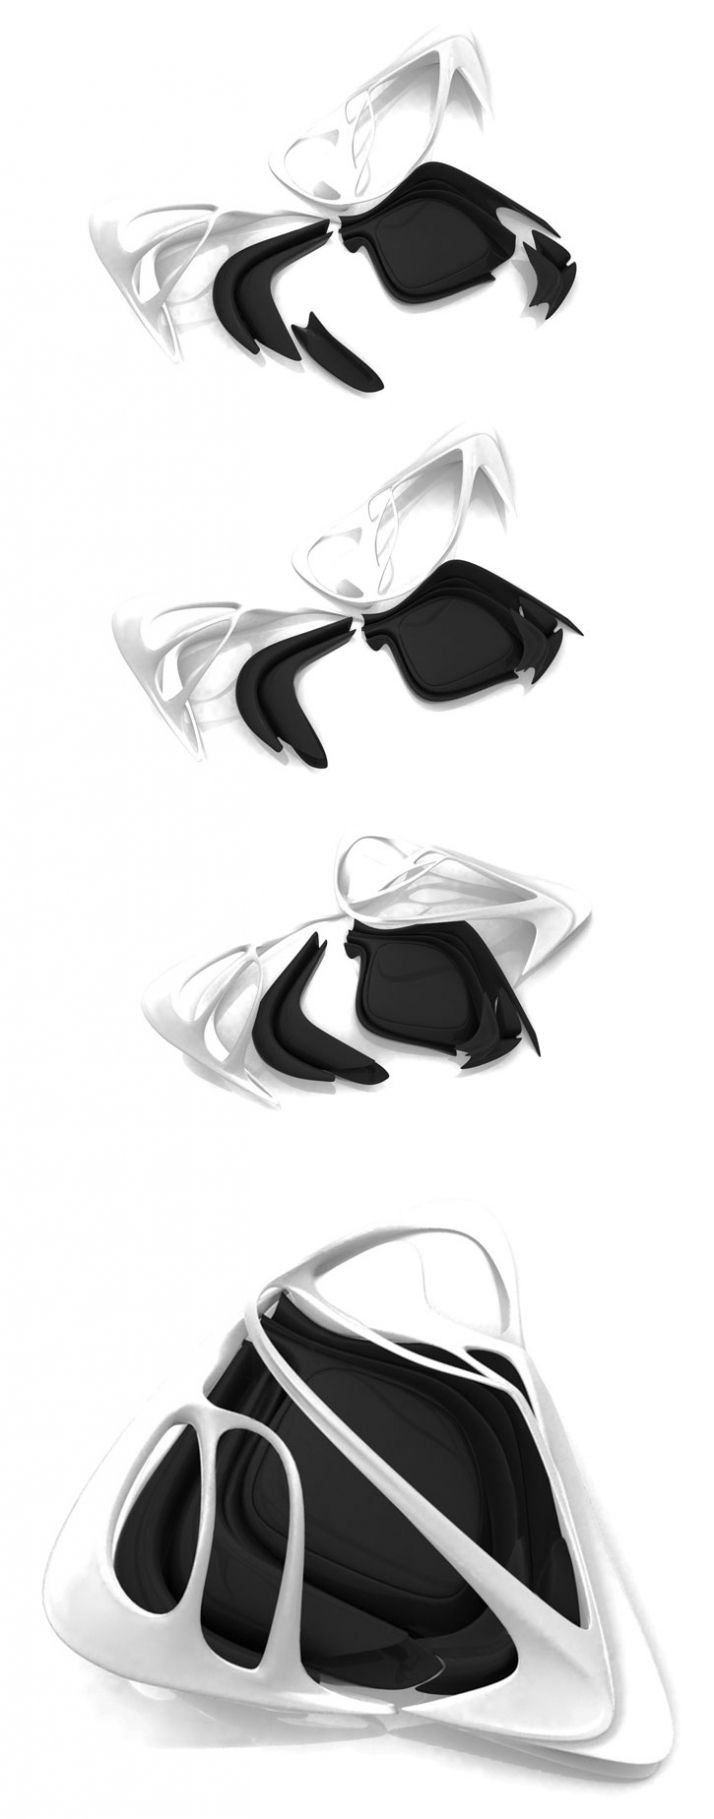 Lotus by Zaha Hadid Architects | Yatzer